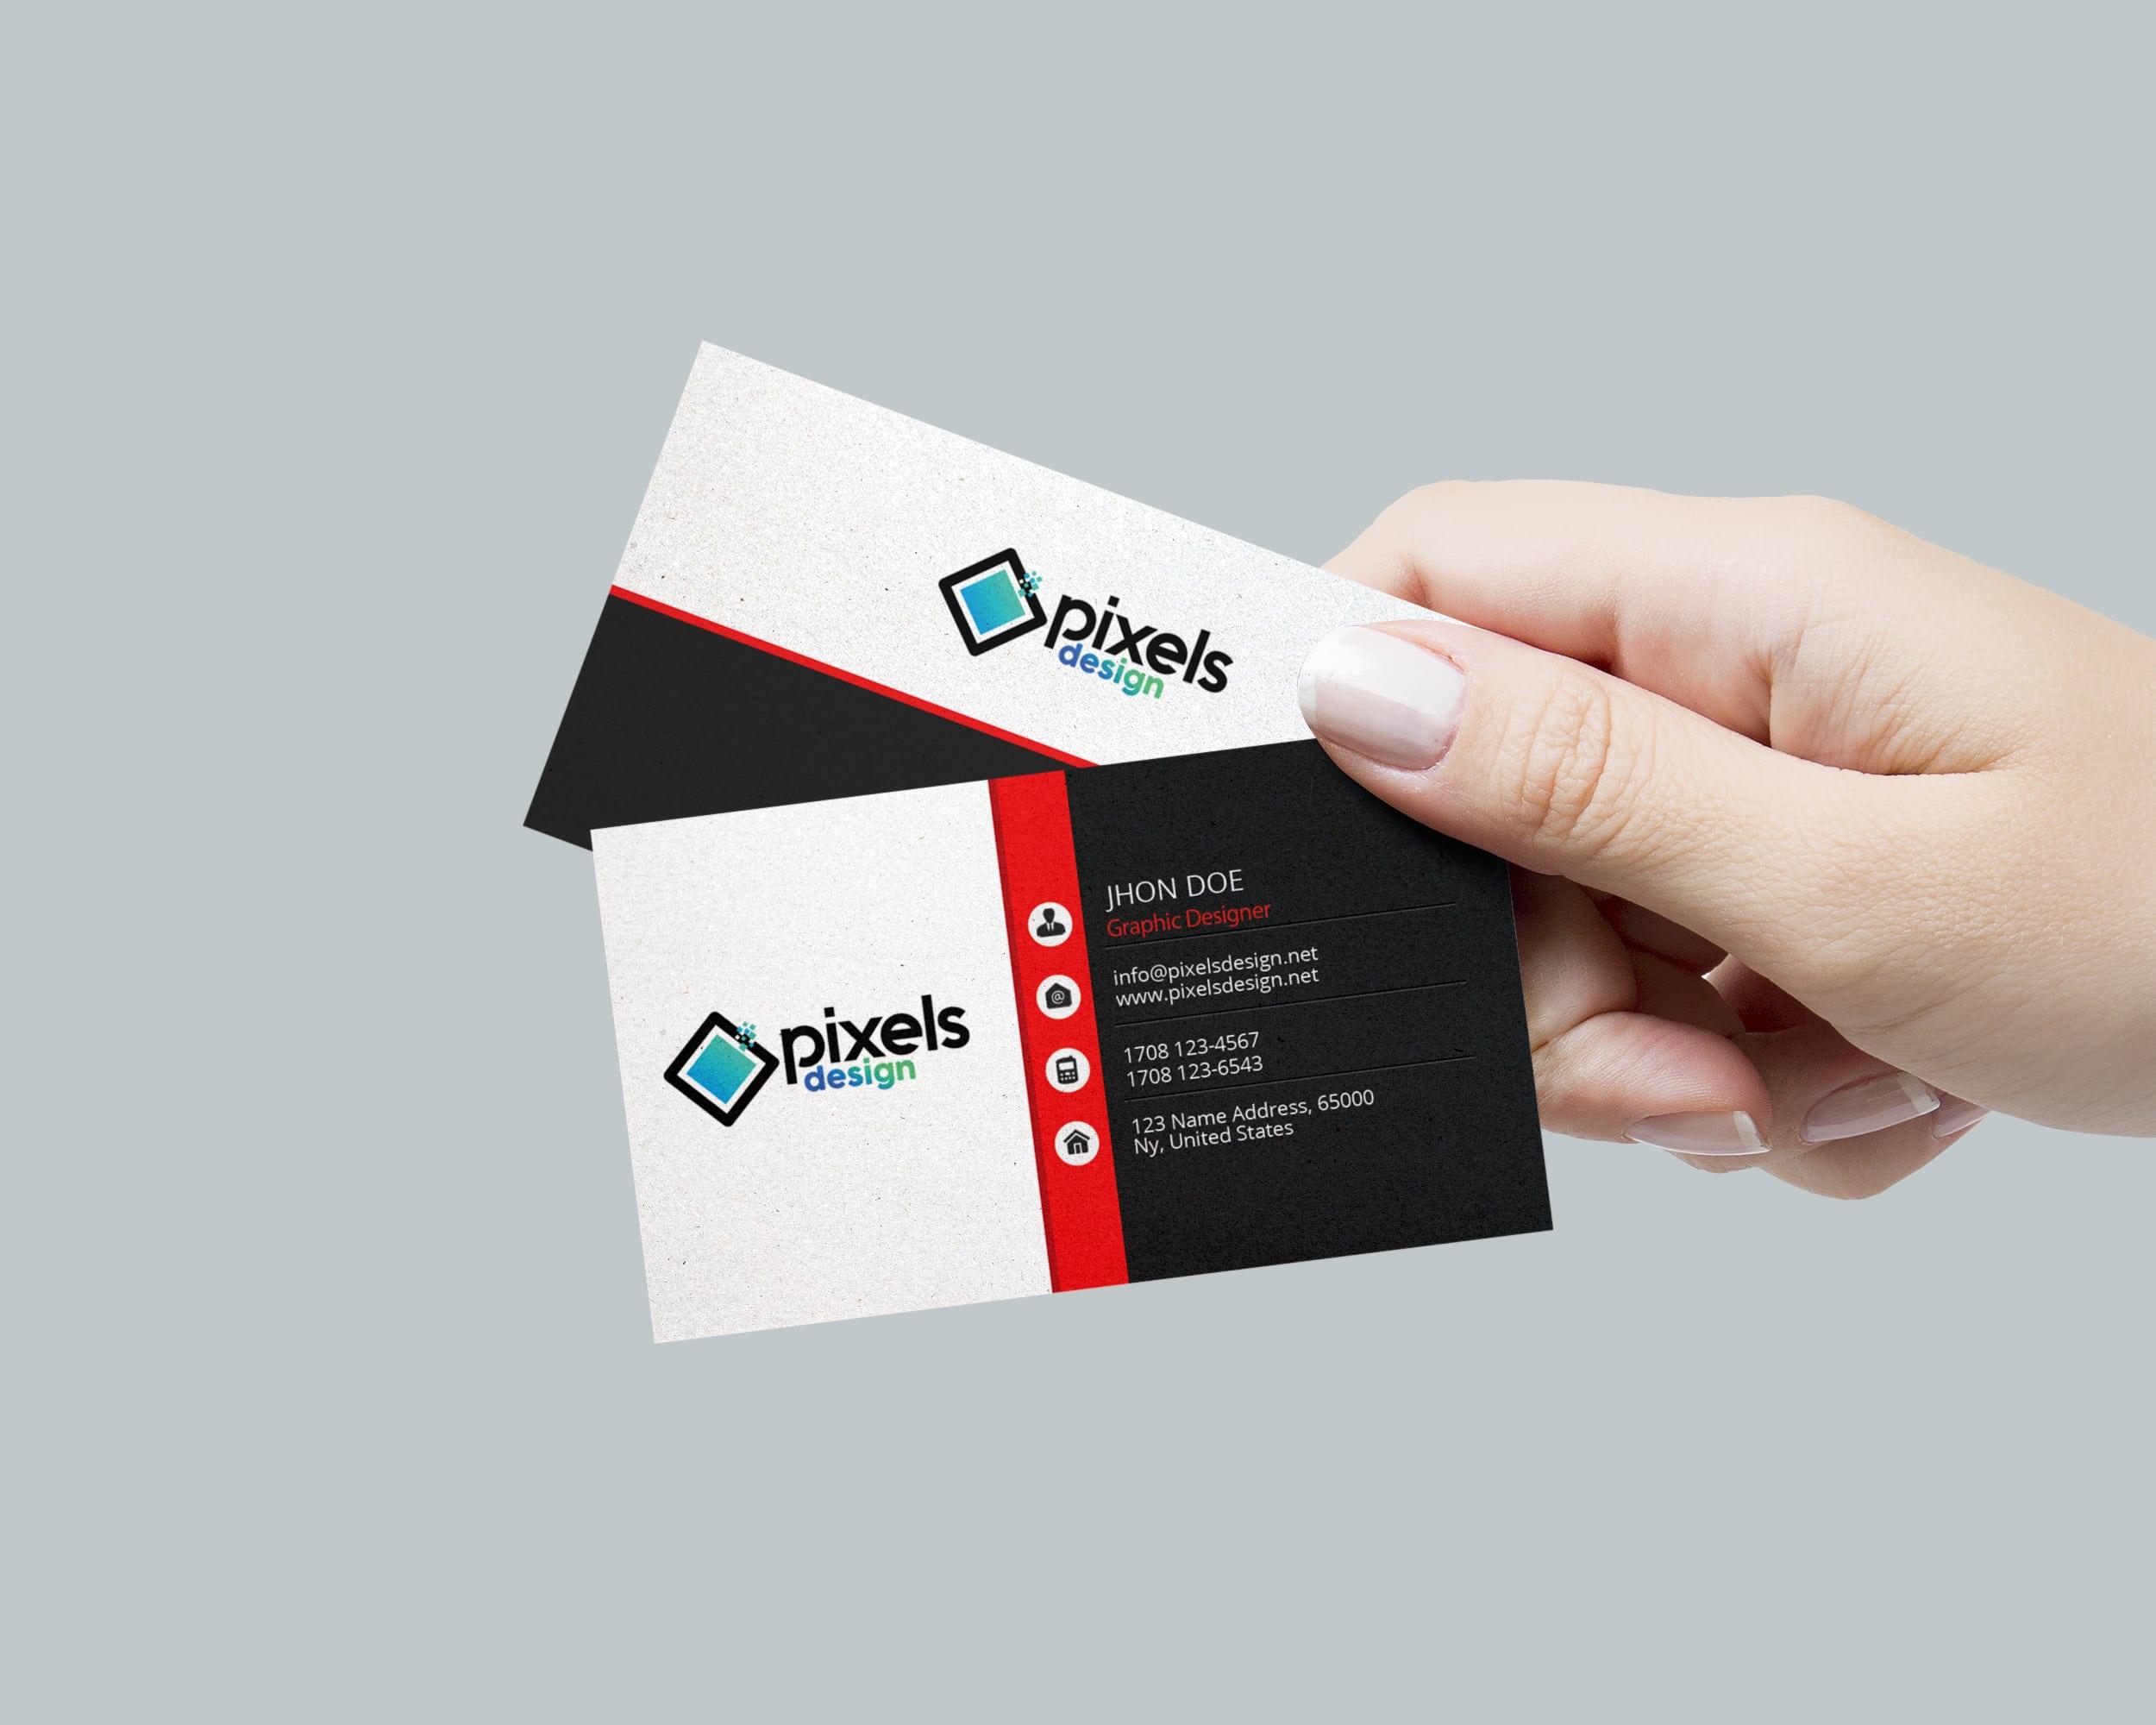 Pixelsdesign | Personal Business Card – Free PSD Template - Pixelsdesign